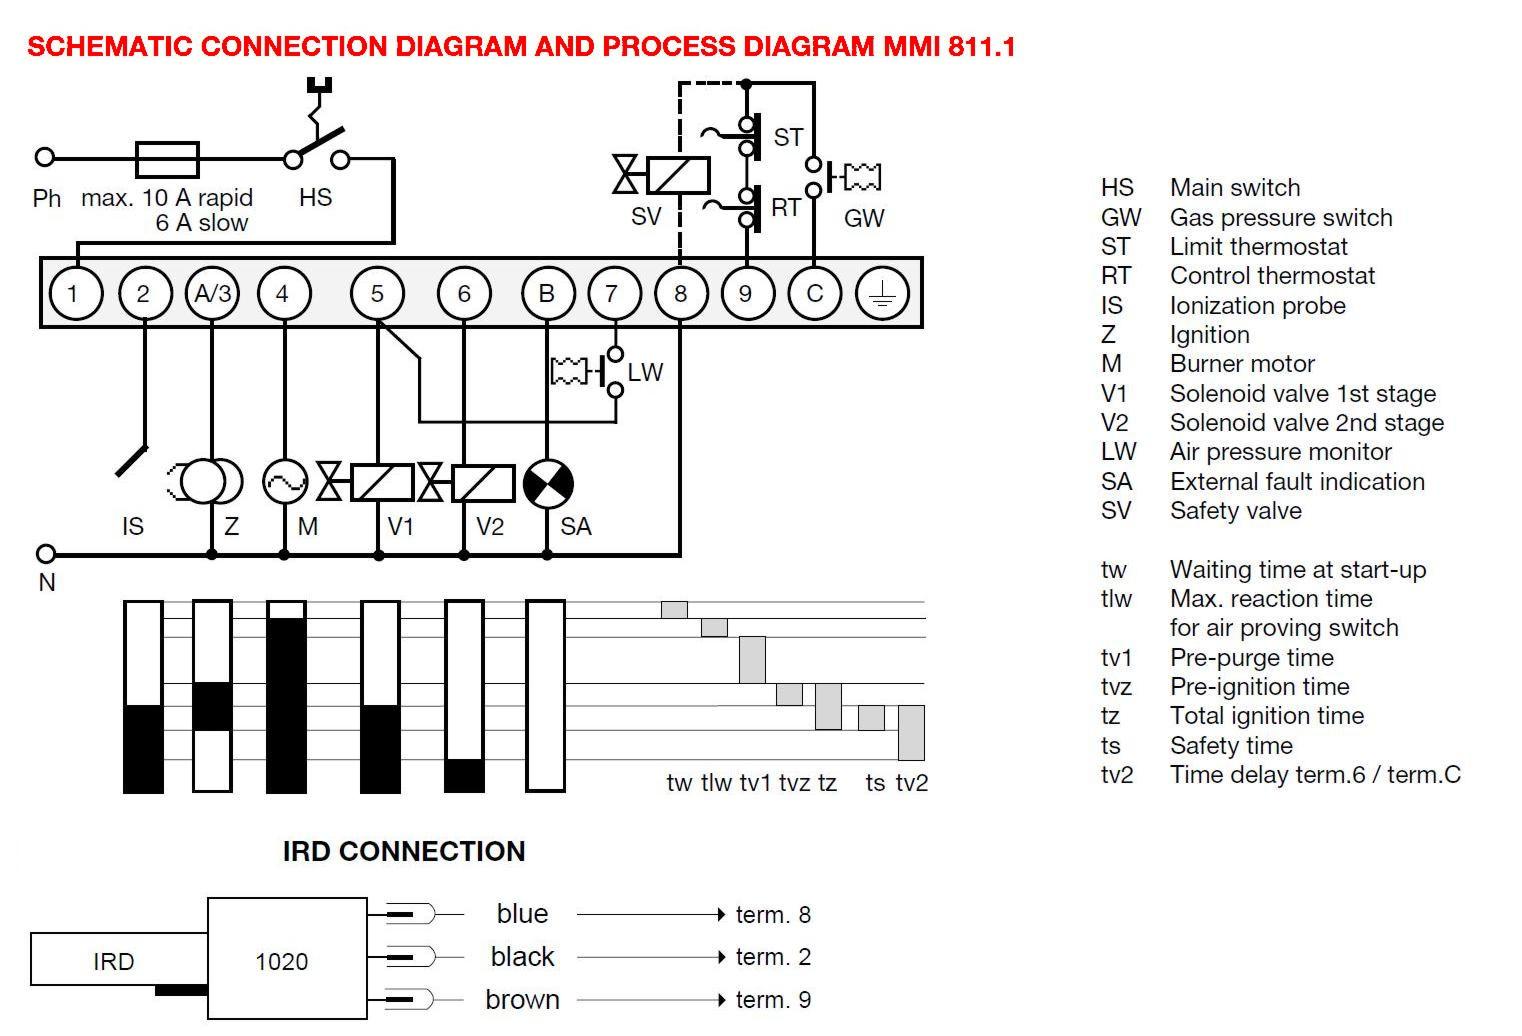 SATRONIC_ MMI 811.1_SCHEMA_ELECTRICA